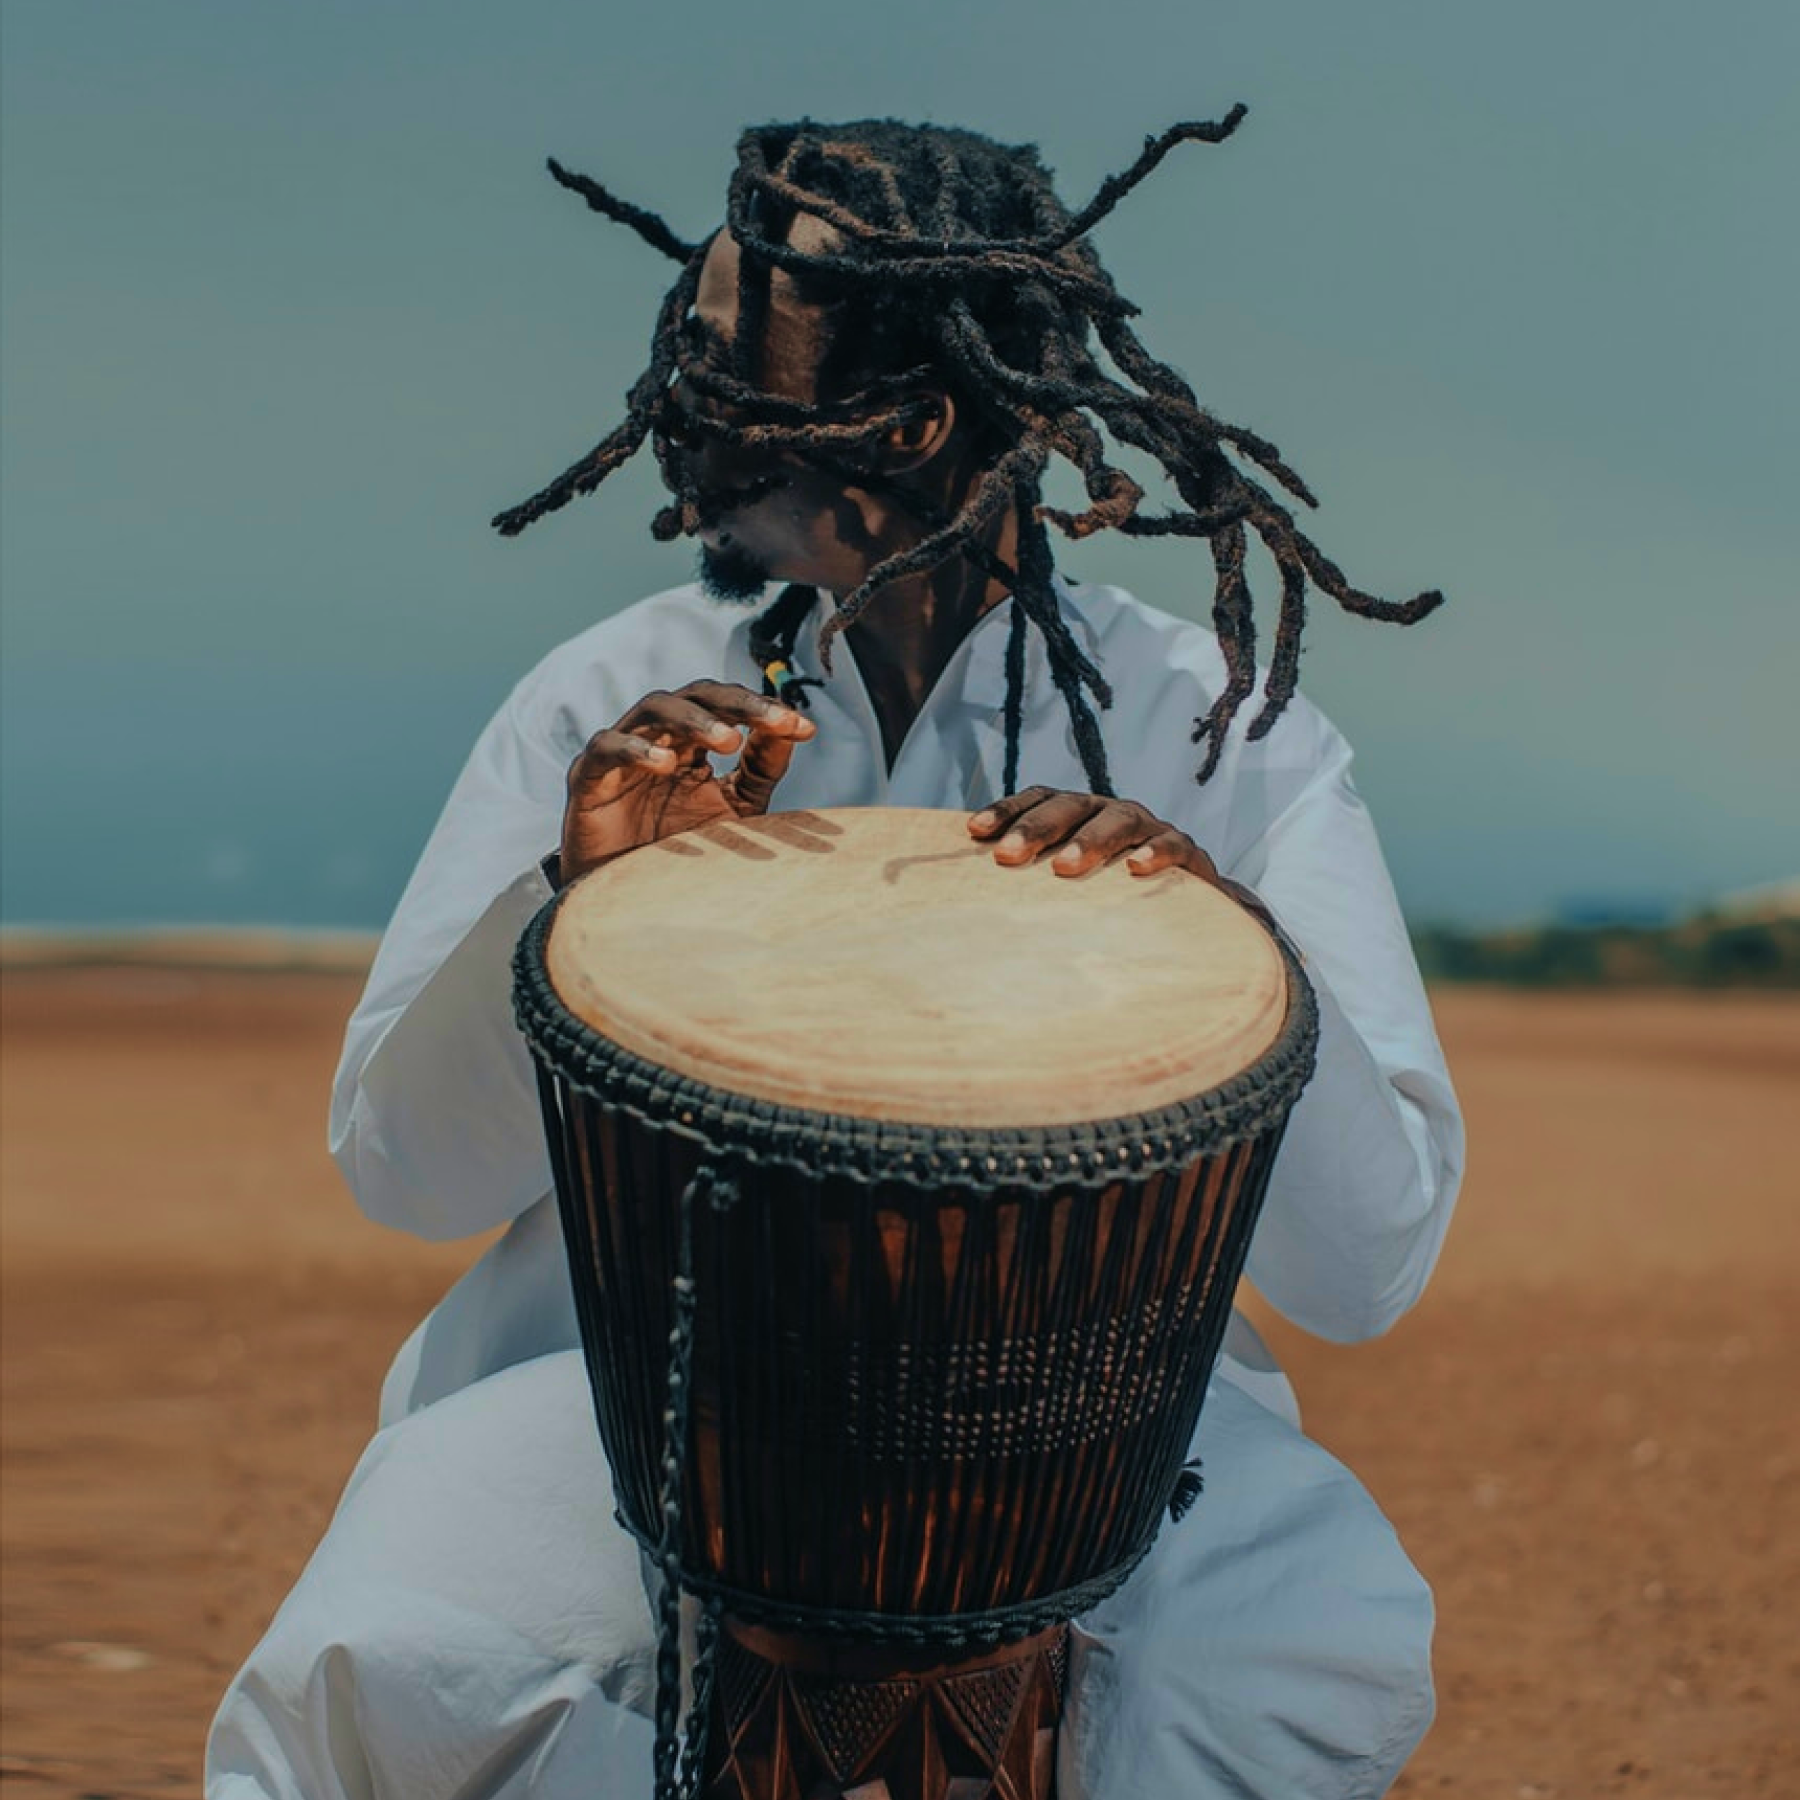 A musician playing an instrument.